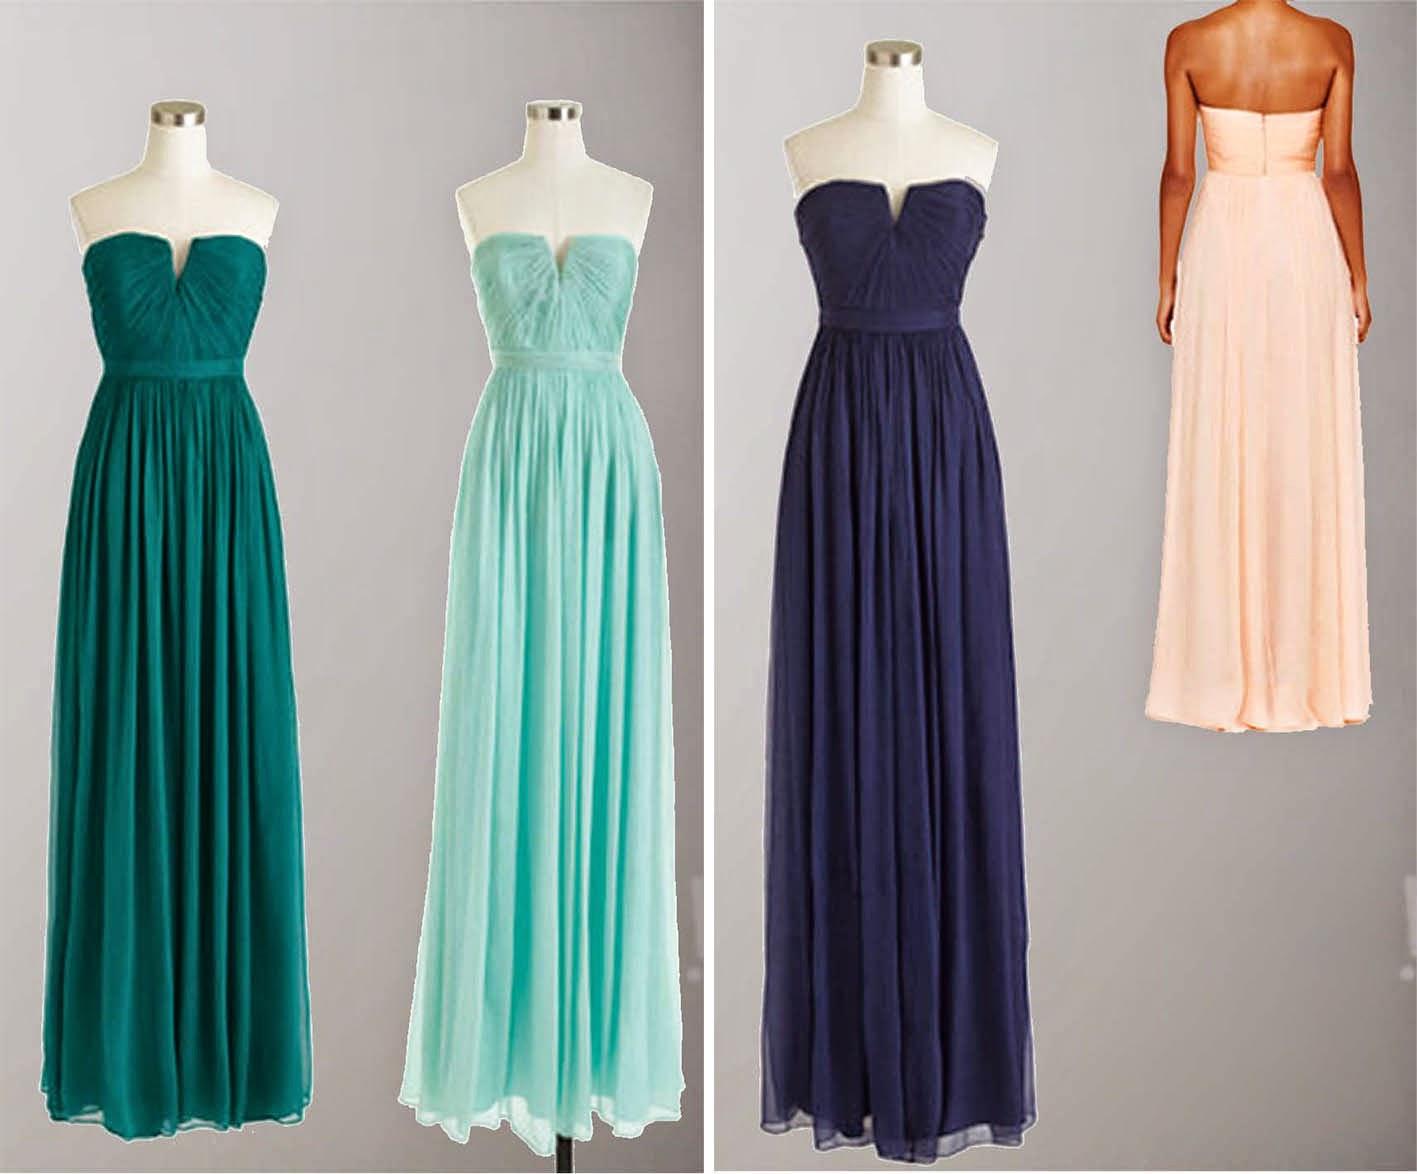 prom dress: 八月 2014